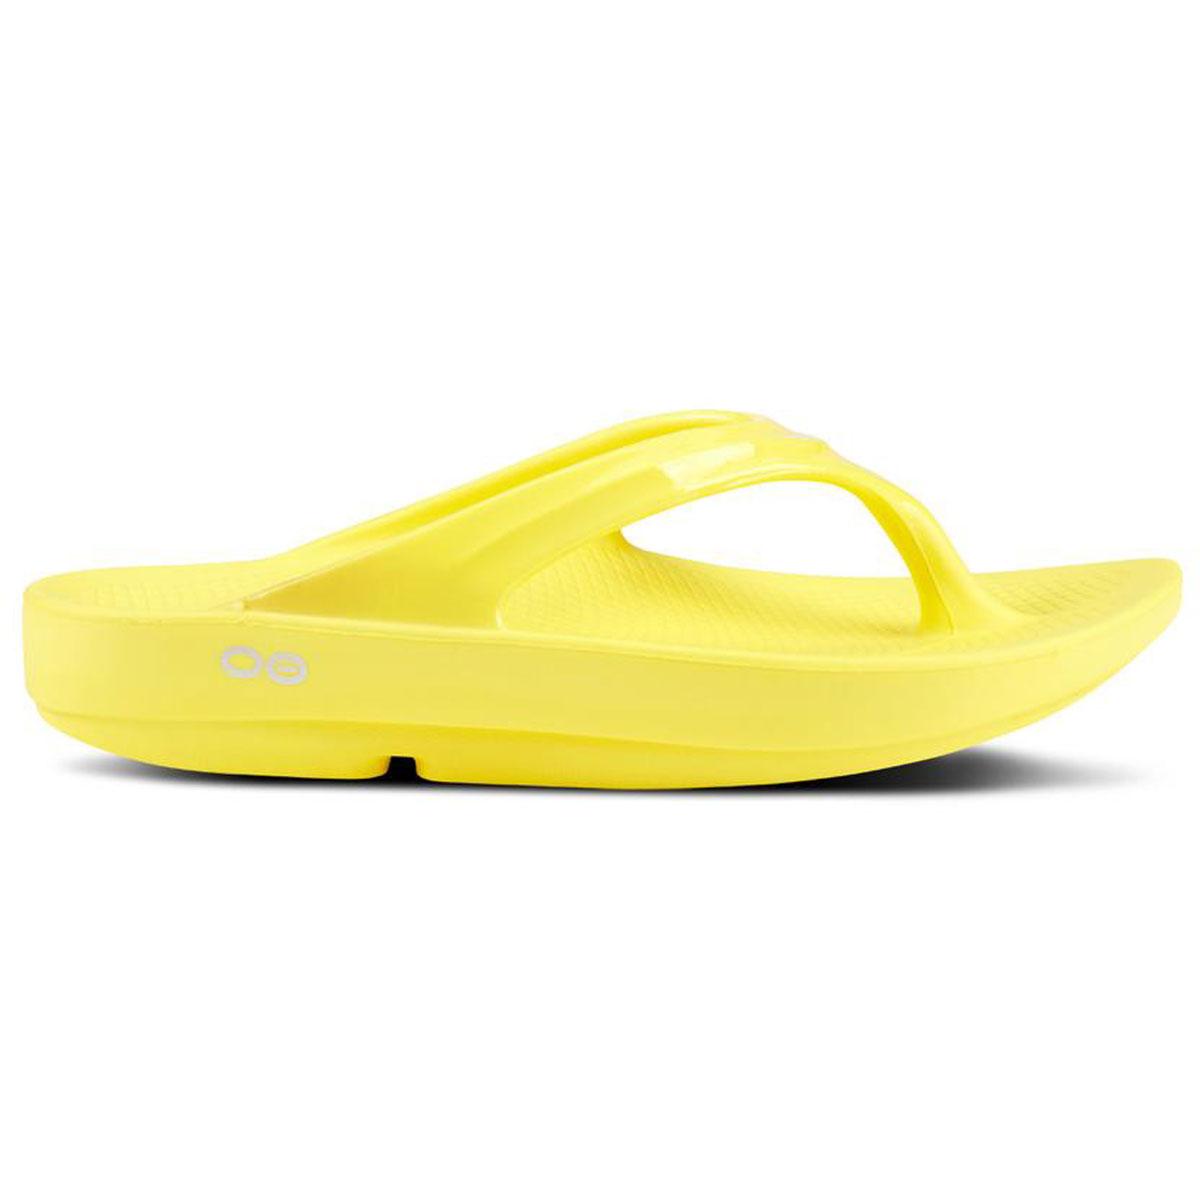 Women's Oofos OOlala Thong Recovery Sandal - Color: Lemon - Size: 5 - Width: Regular, Lemon, large, image 1